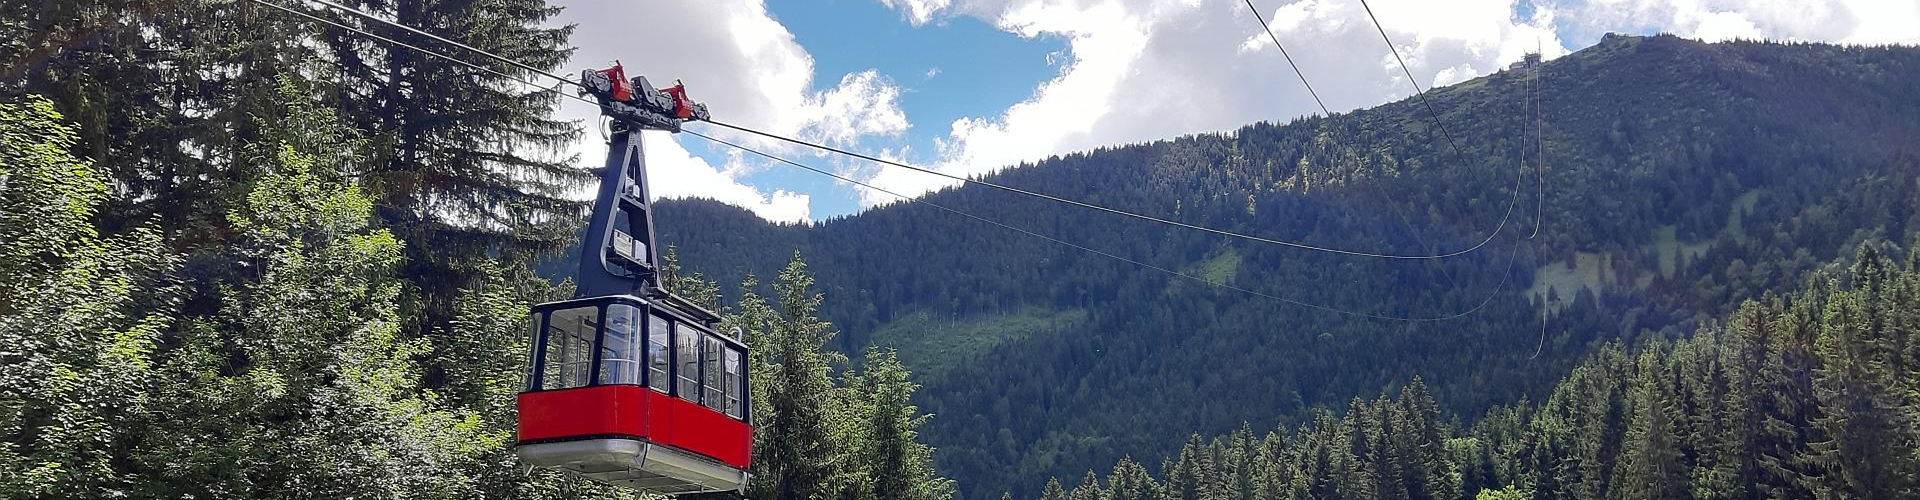 Hochriesbahn Kabine2 20200618 Gh Head